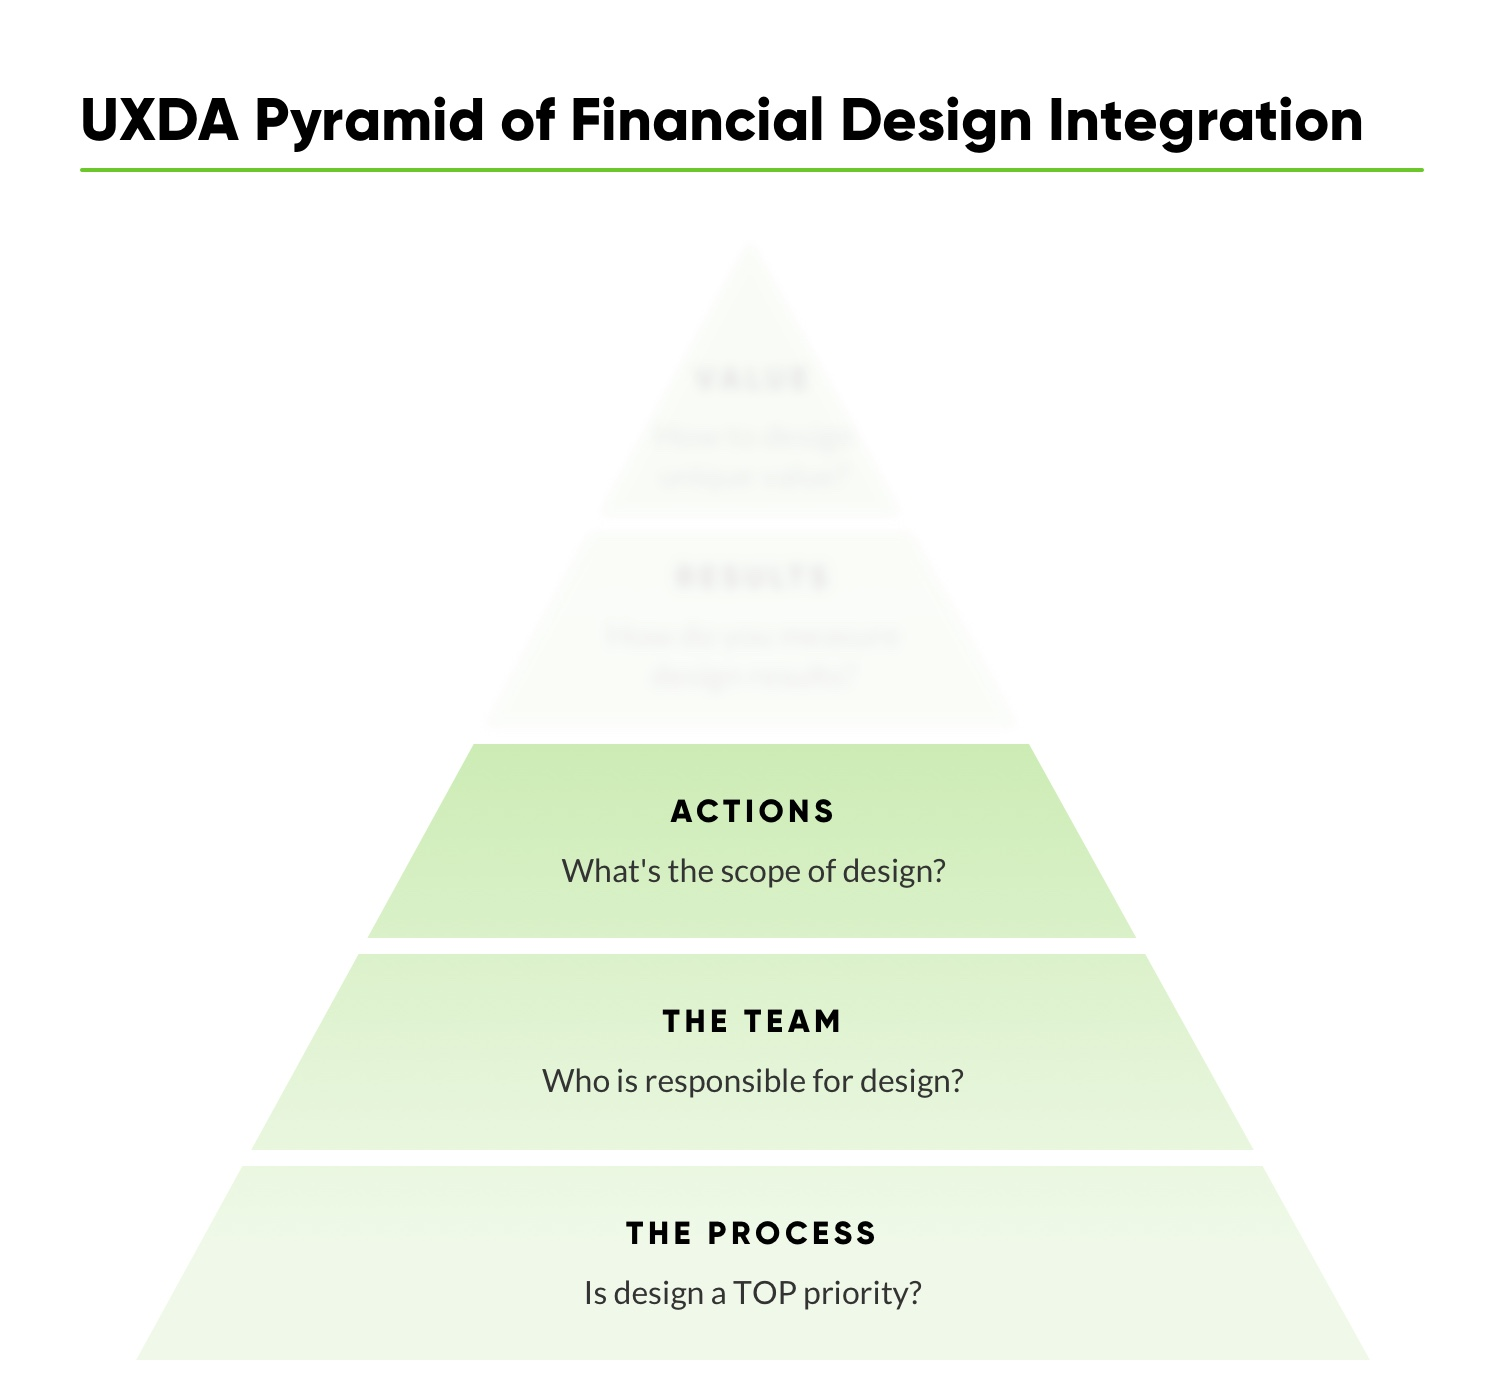 financial-ux-design-methodology-uxda-financial-design-integration-3-S.jpg